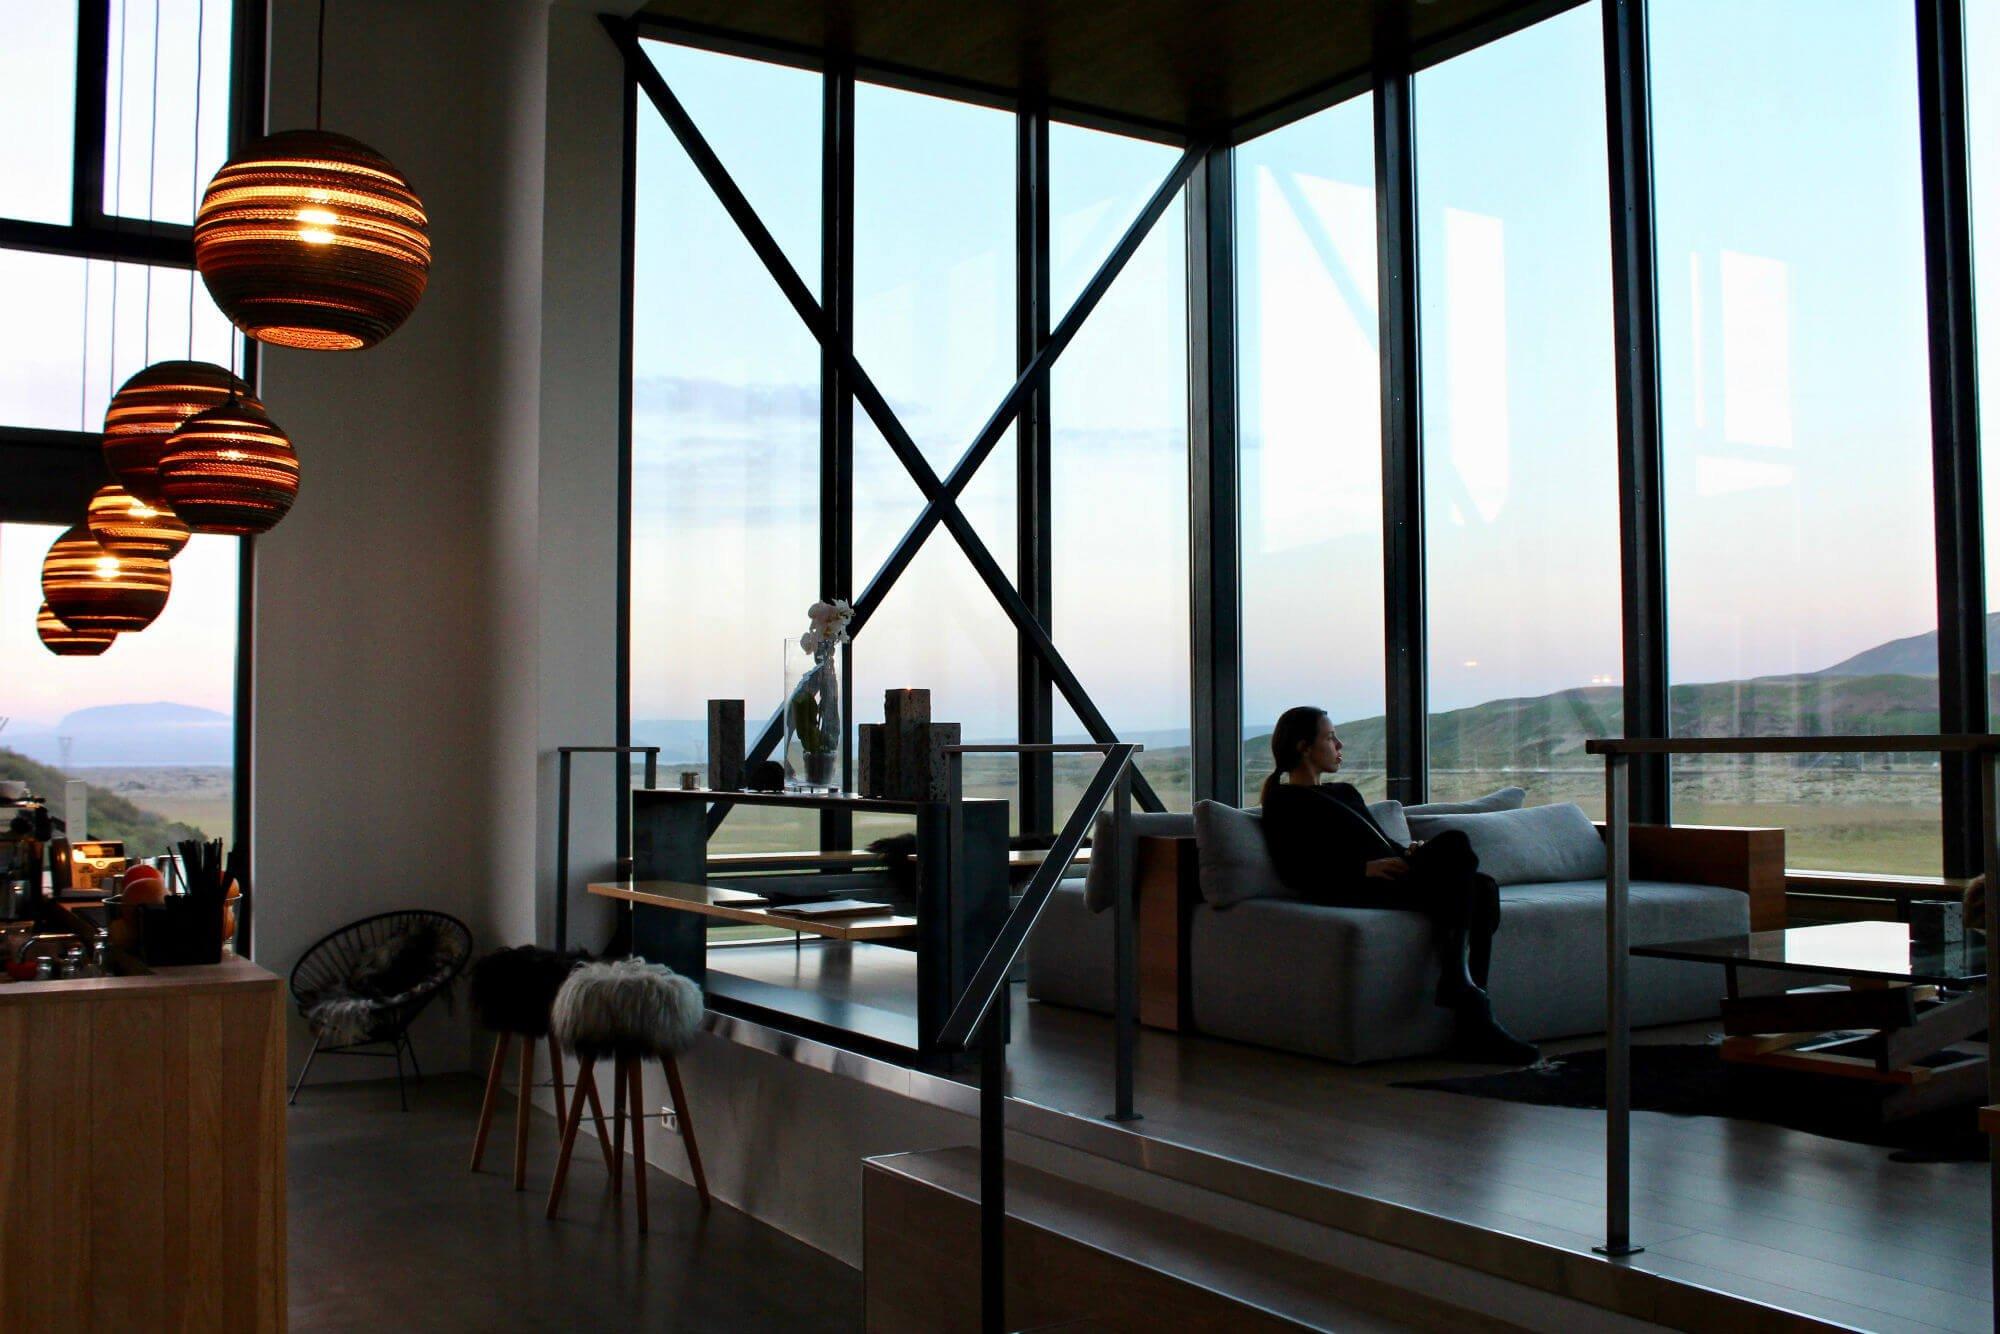 ion adventure hotel 1 CAFFETTERIE PARTICOLARI